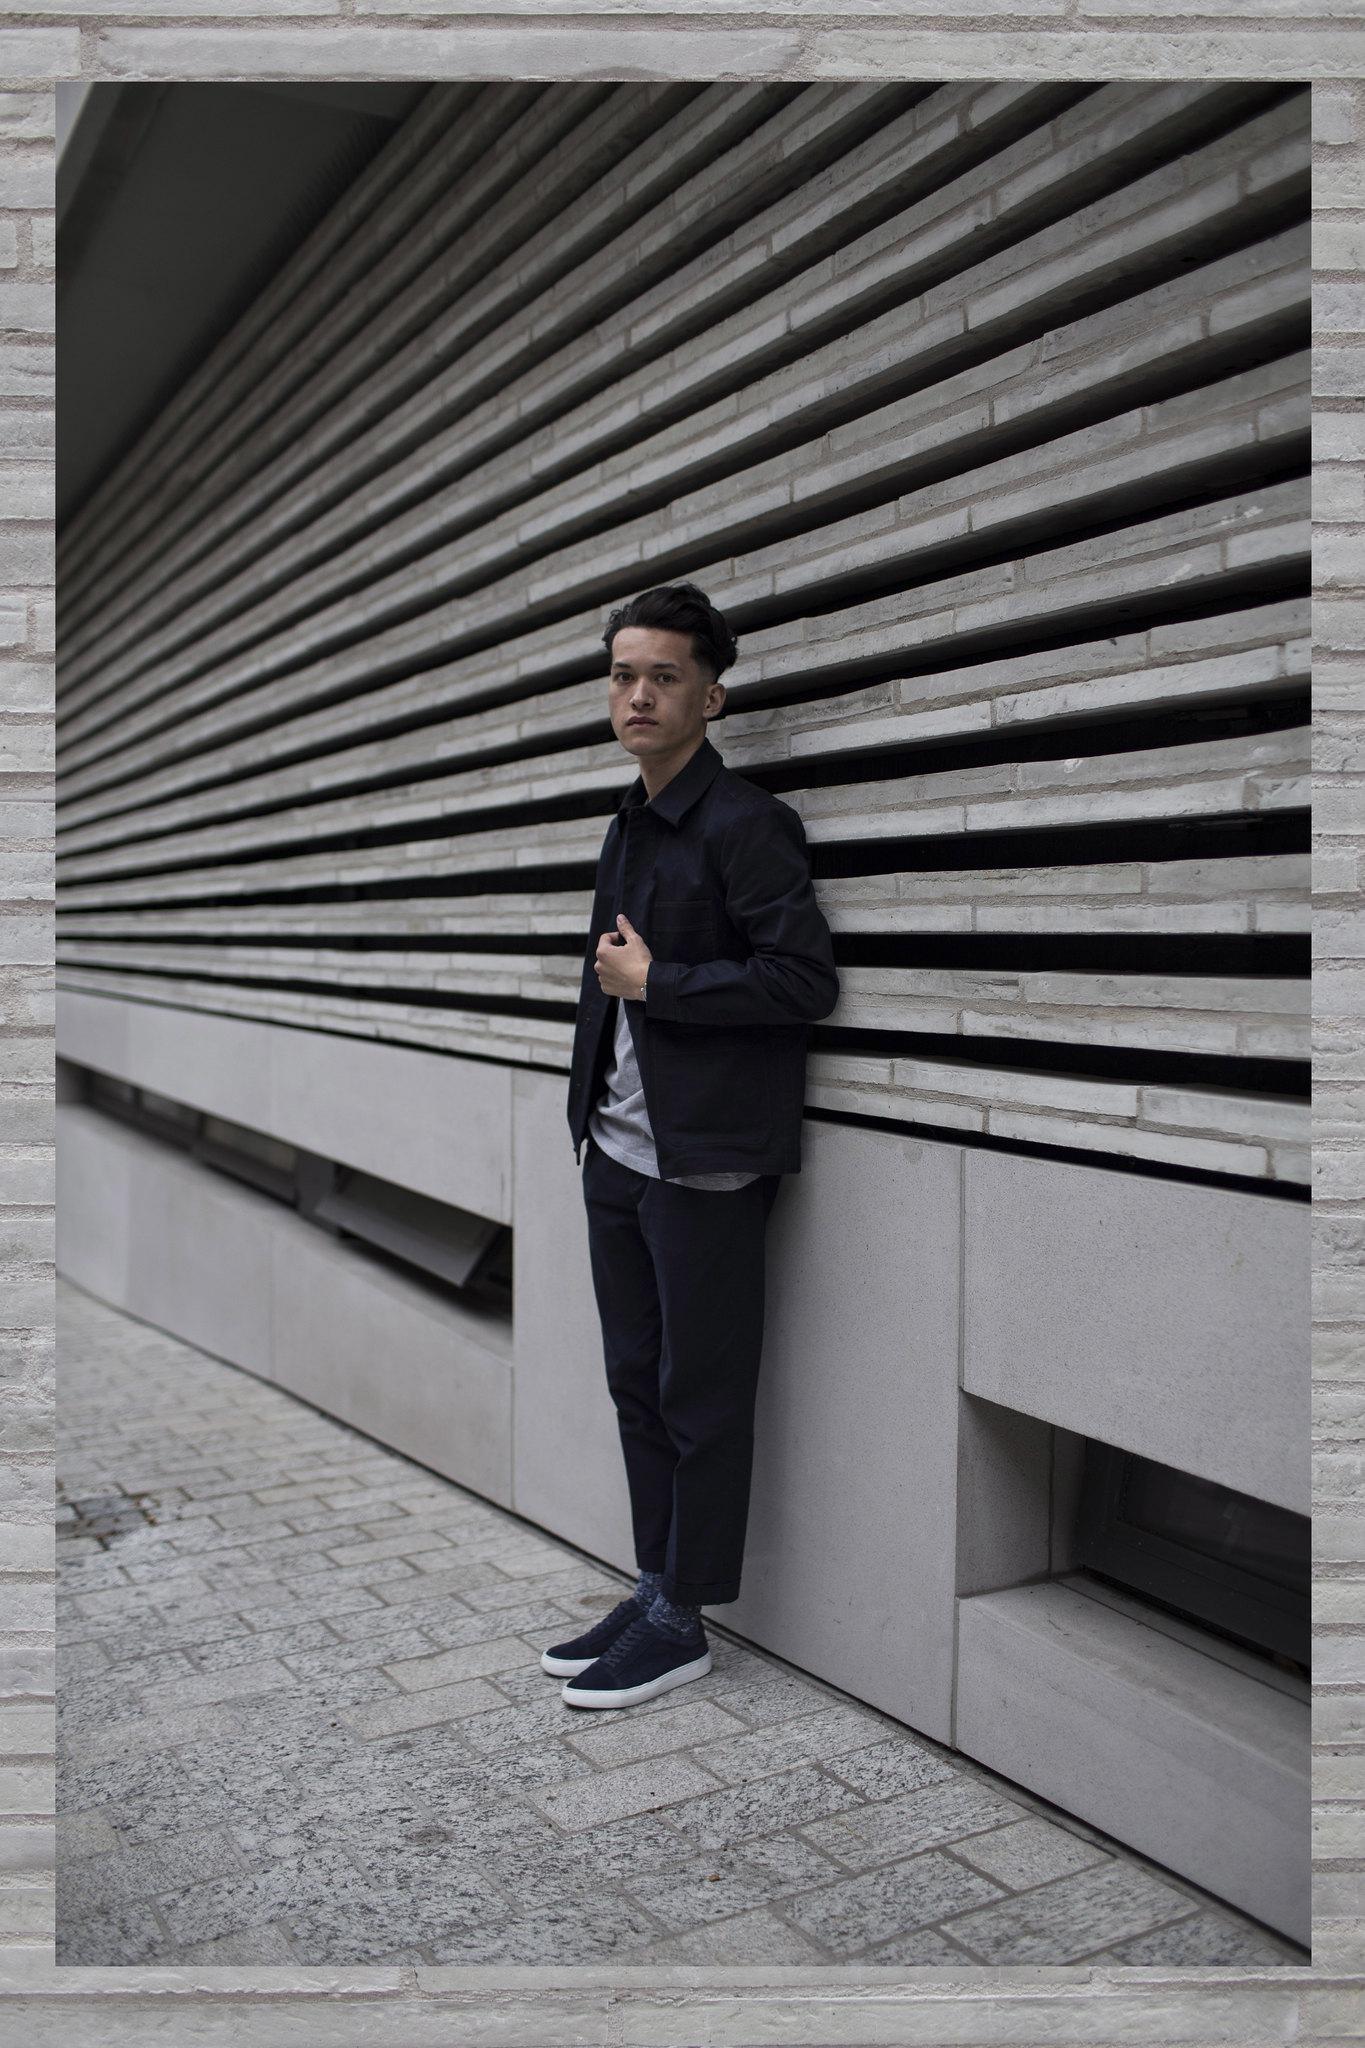 Jordan_Bunker_dune_london_14